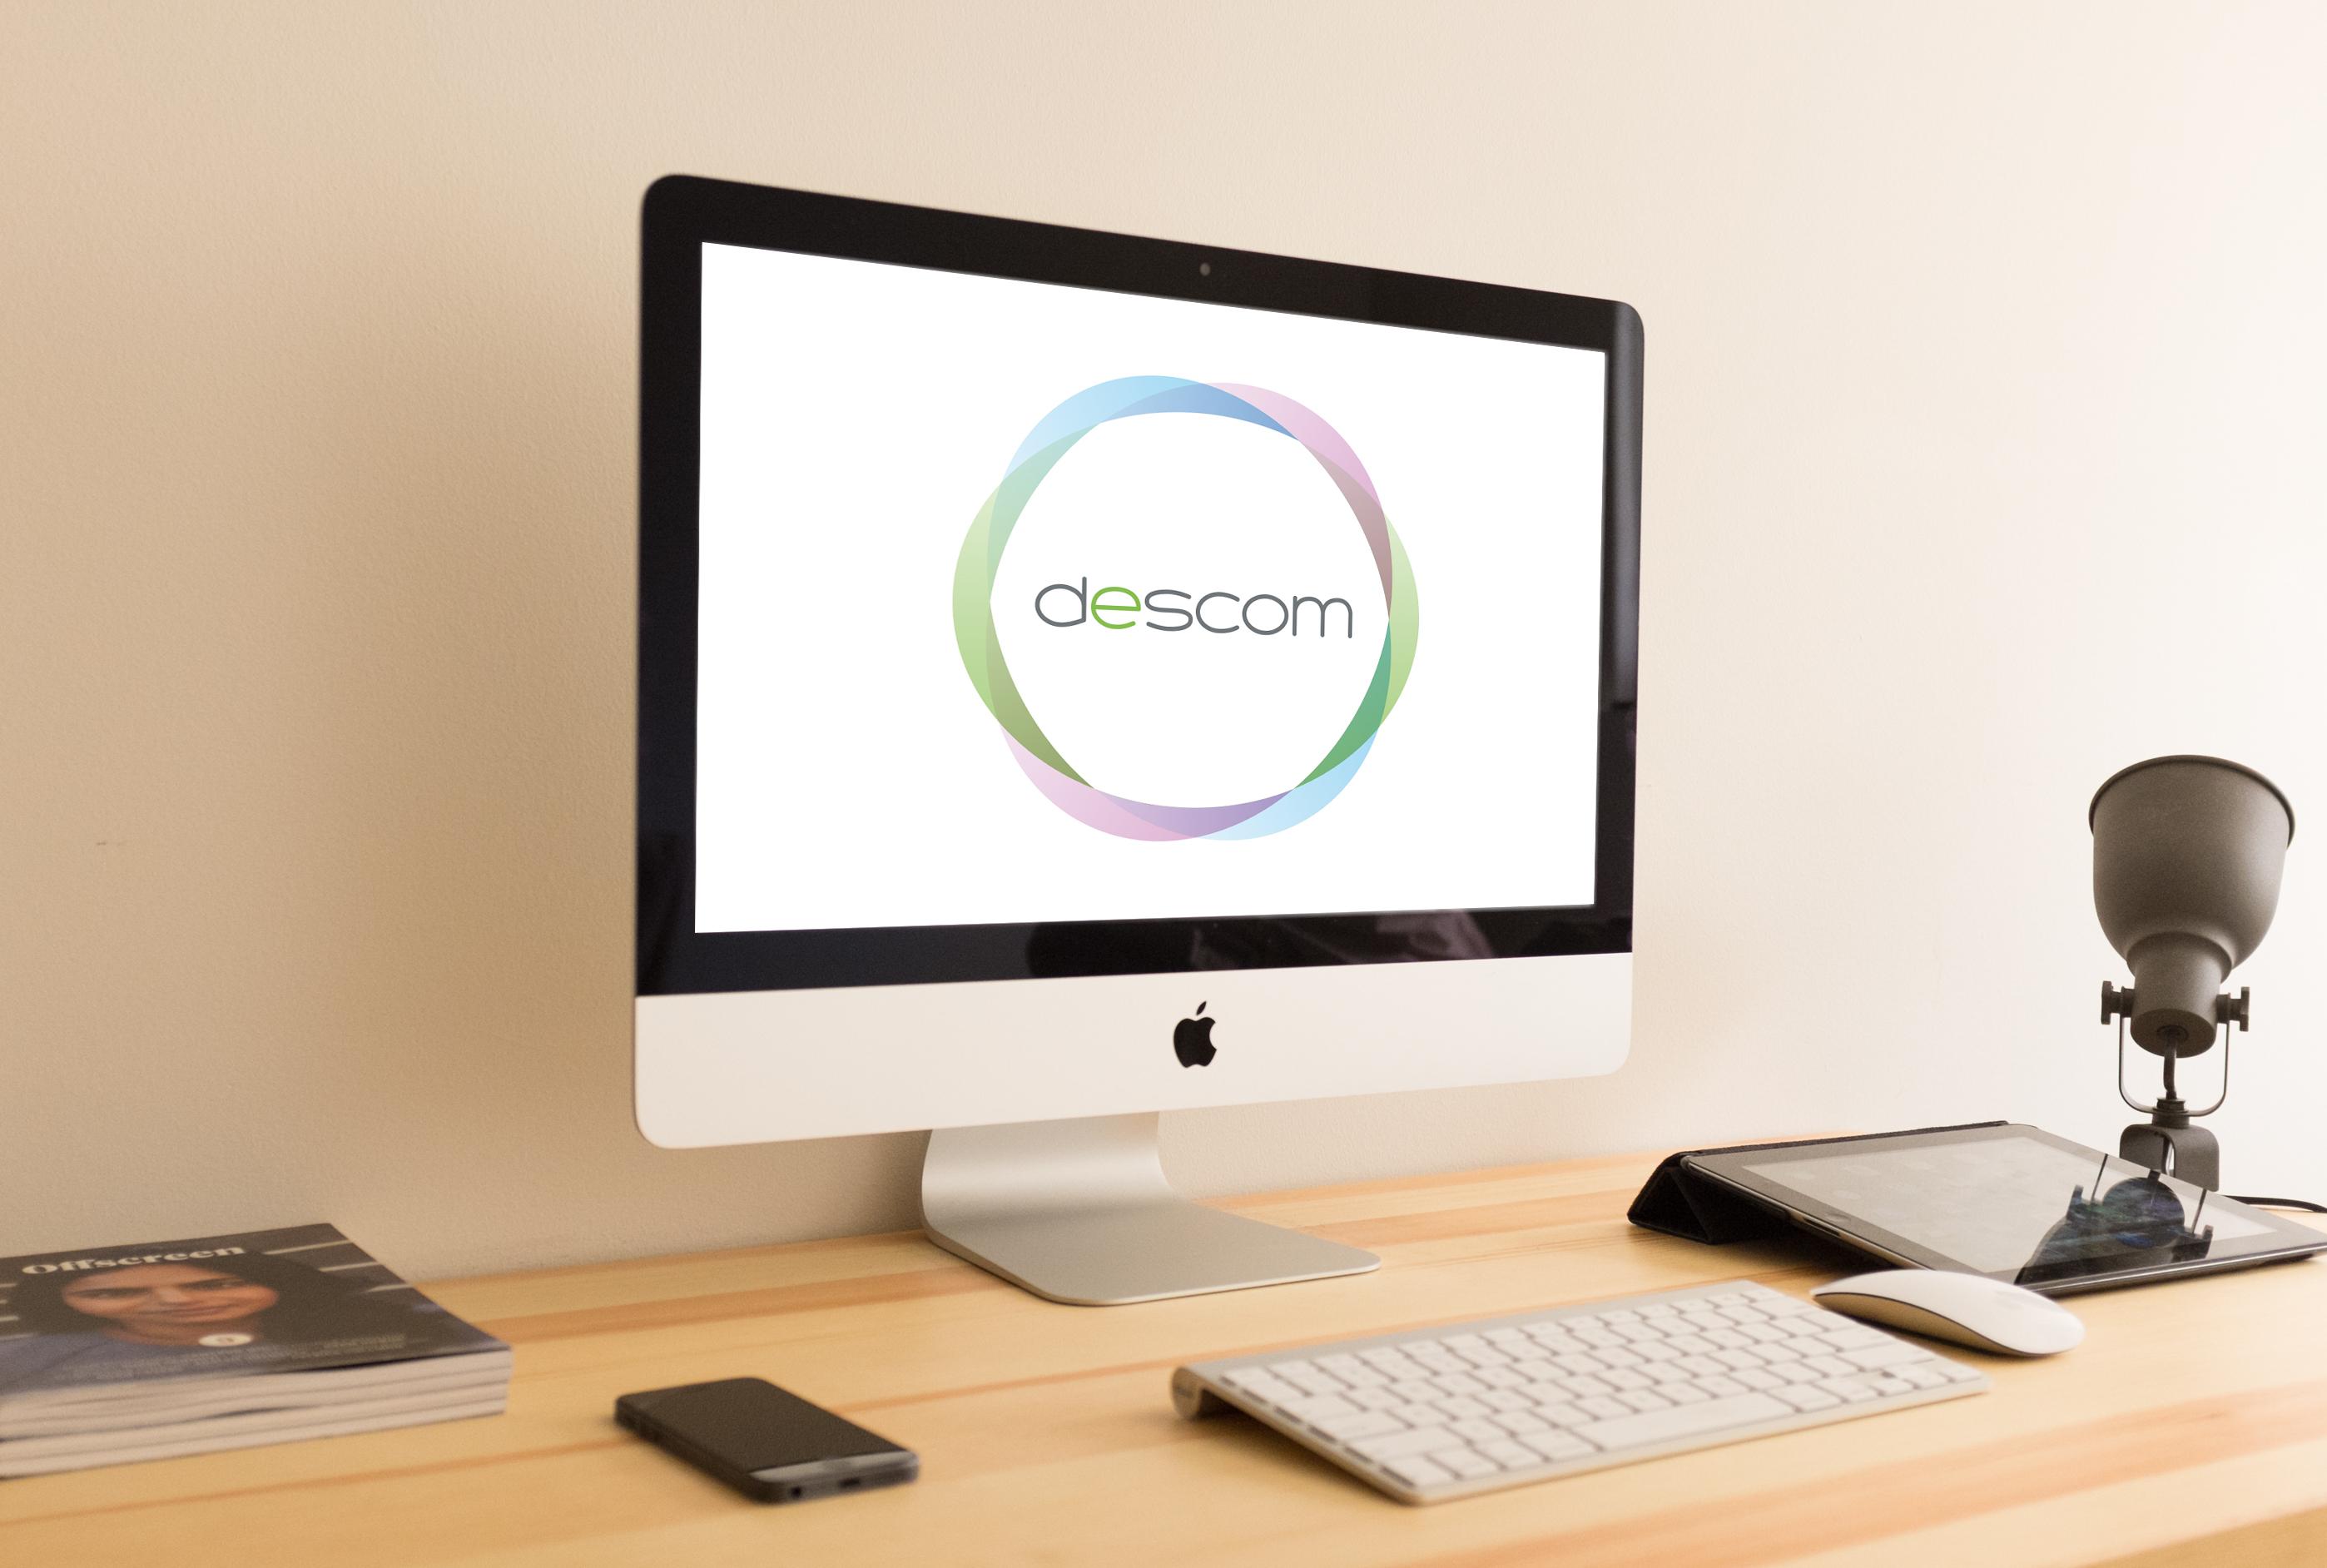 descom_Mockup